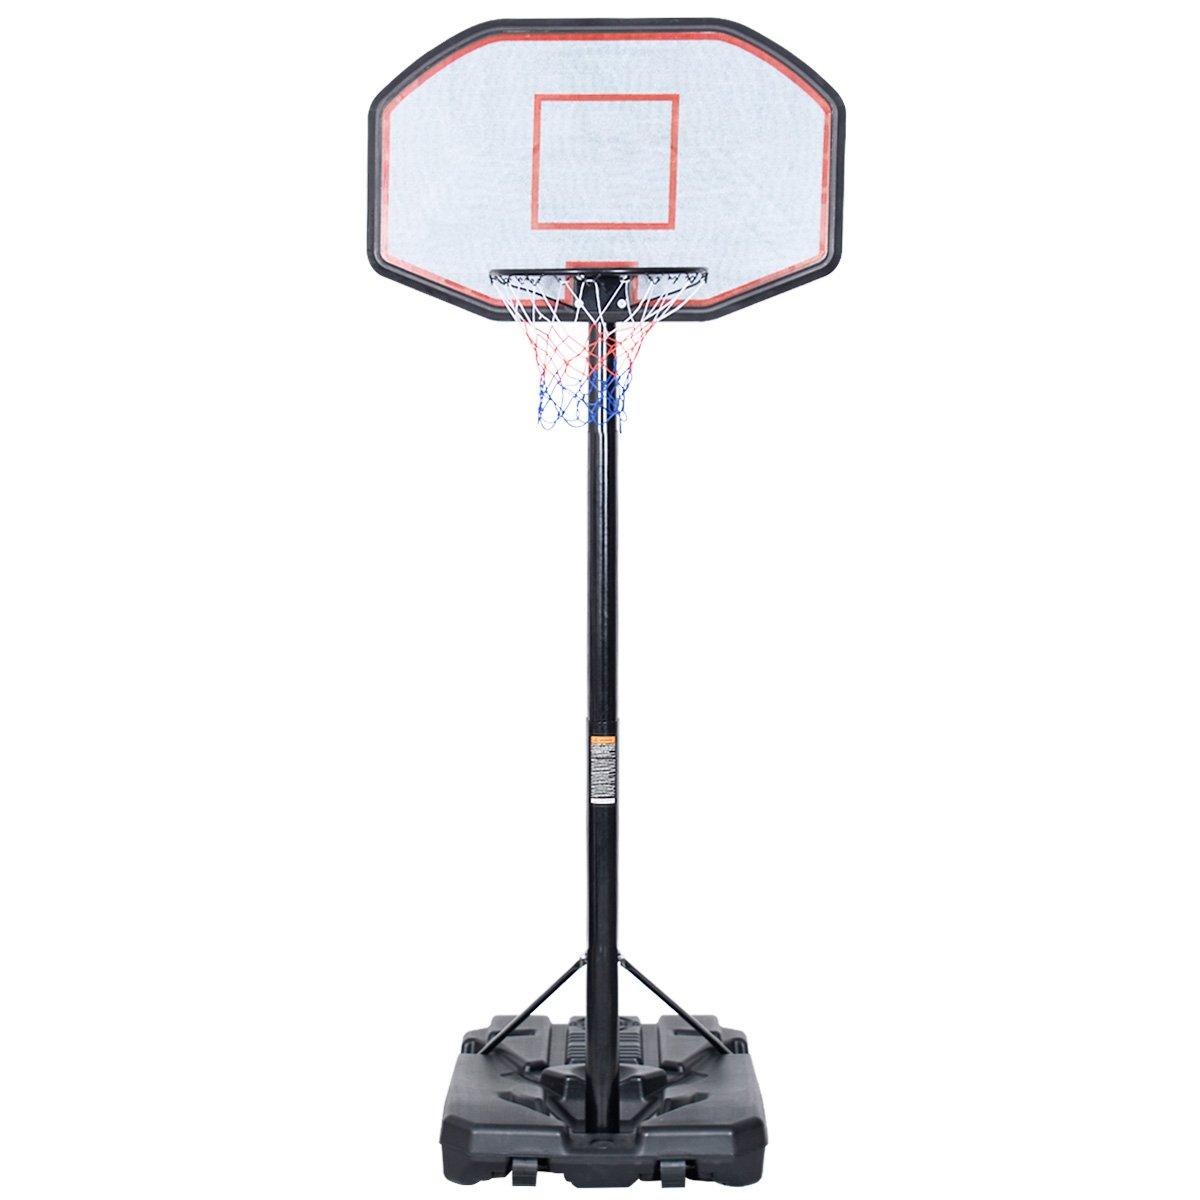 10FT 42''x28'' Backboard In/Outdoor Adjustable Height Basketball Hoop System